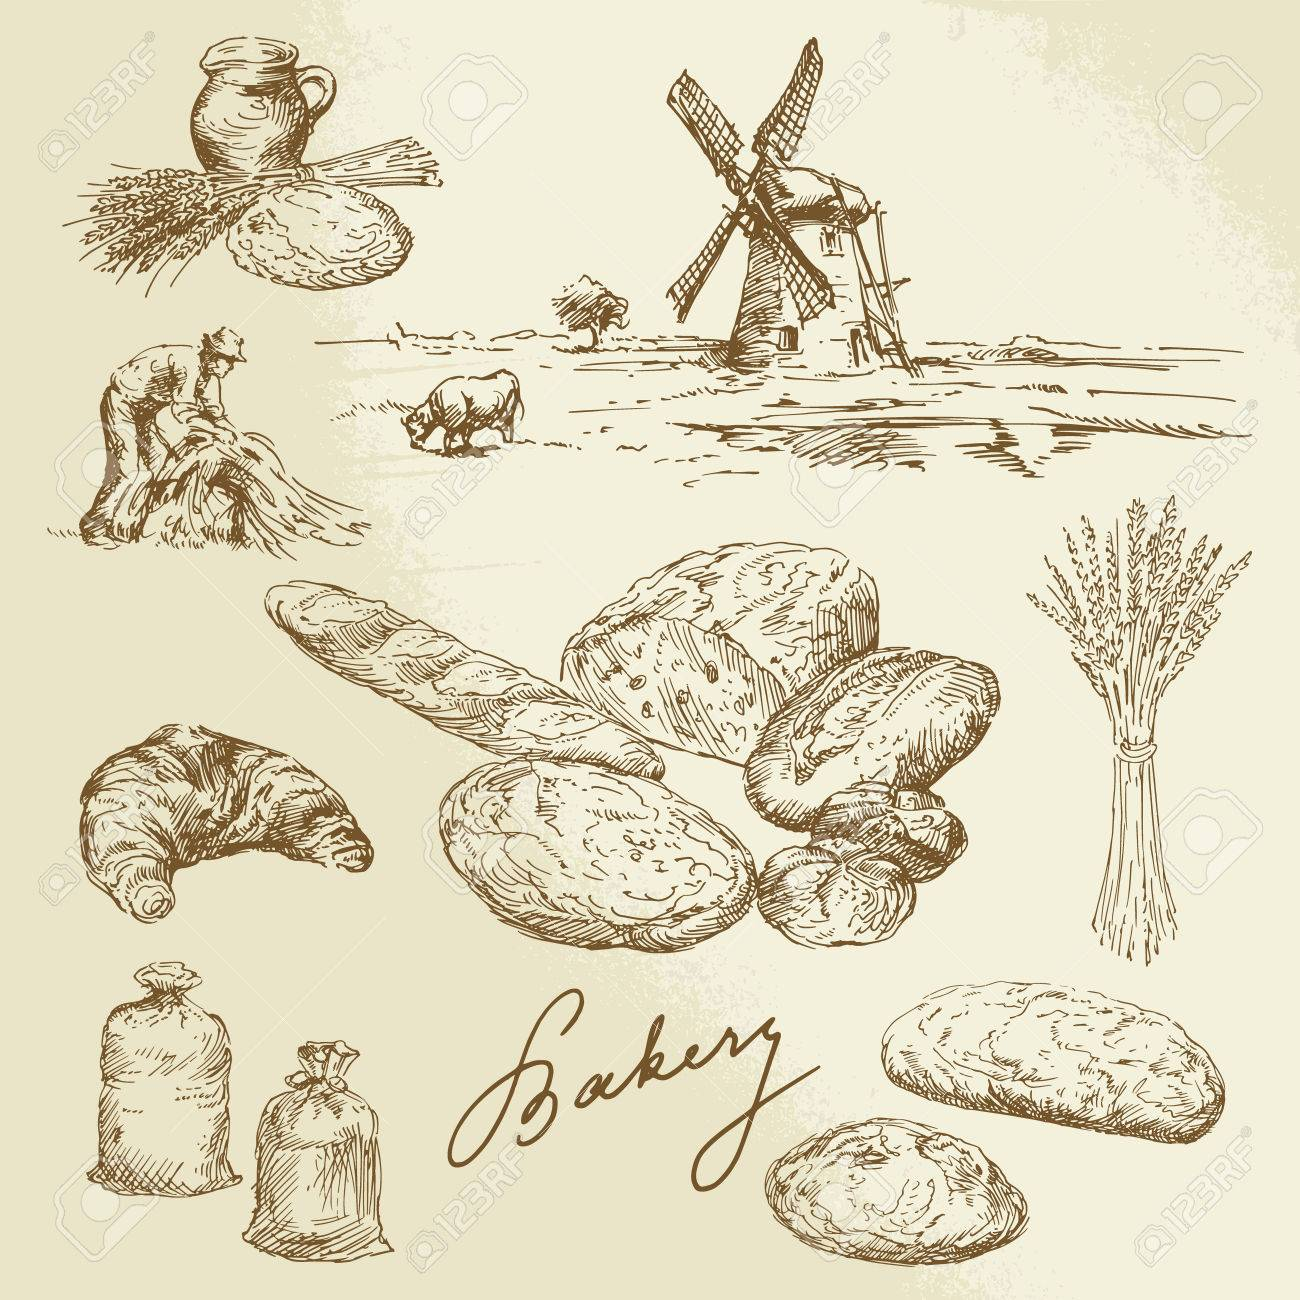 bakery, rural landscape, bread - hand drawn set - 24058163